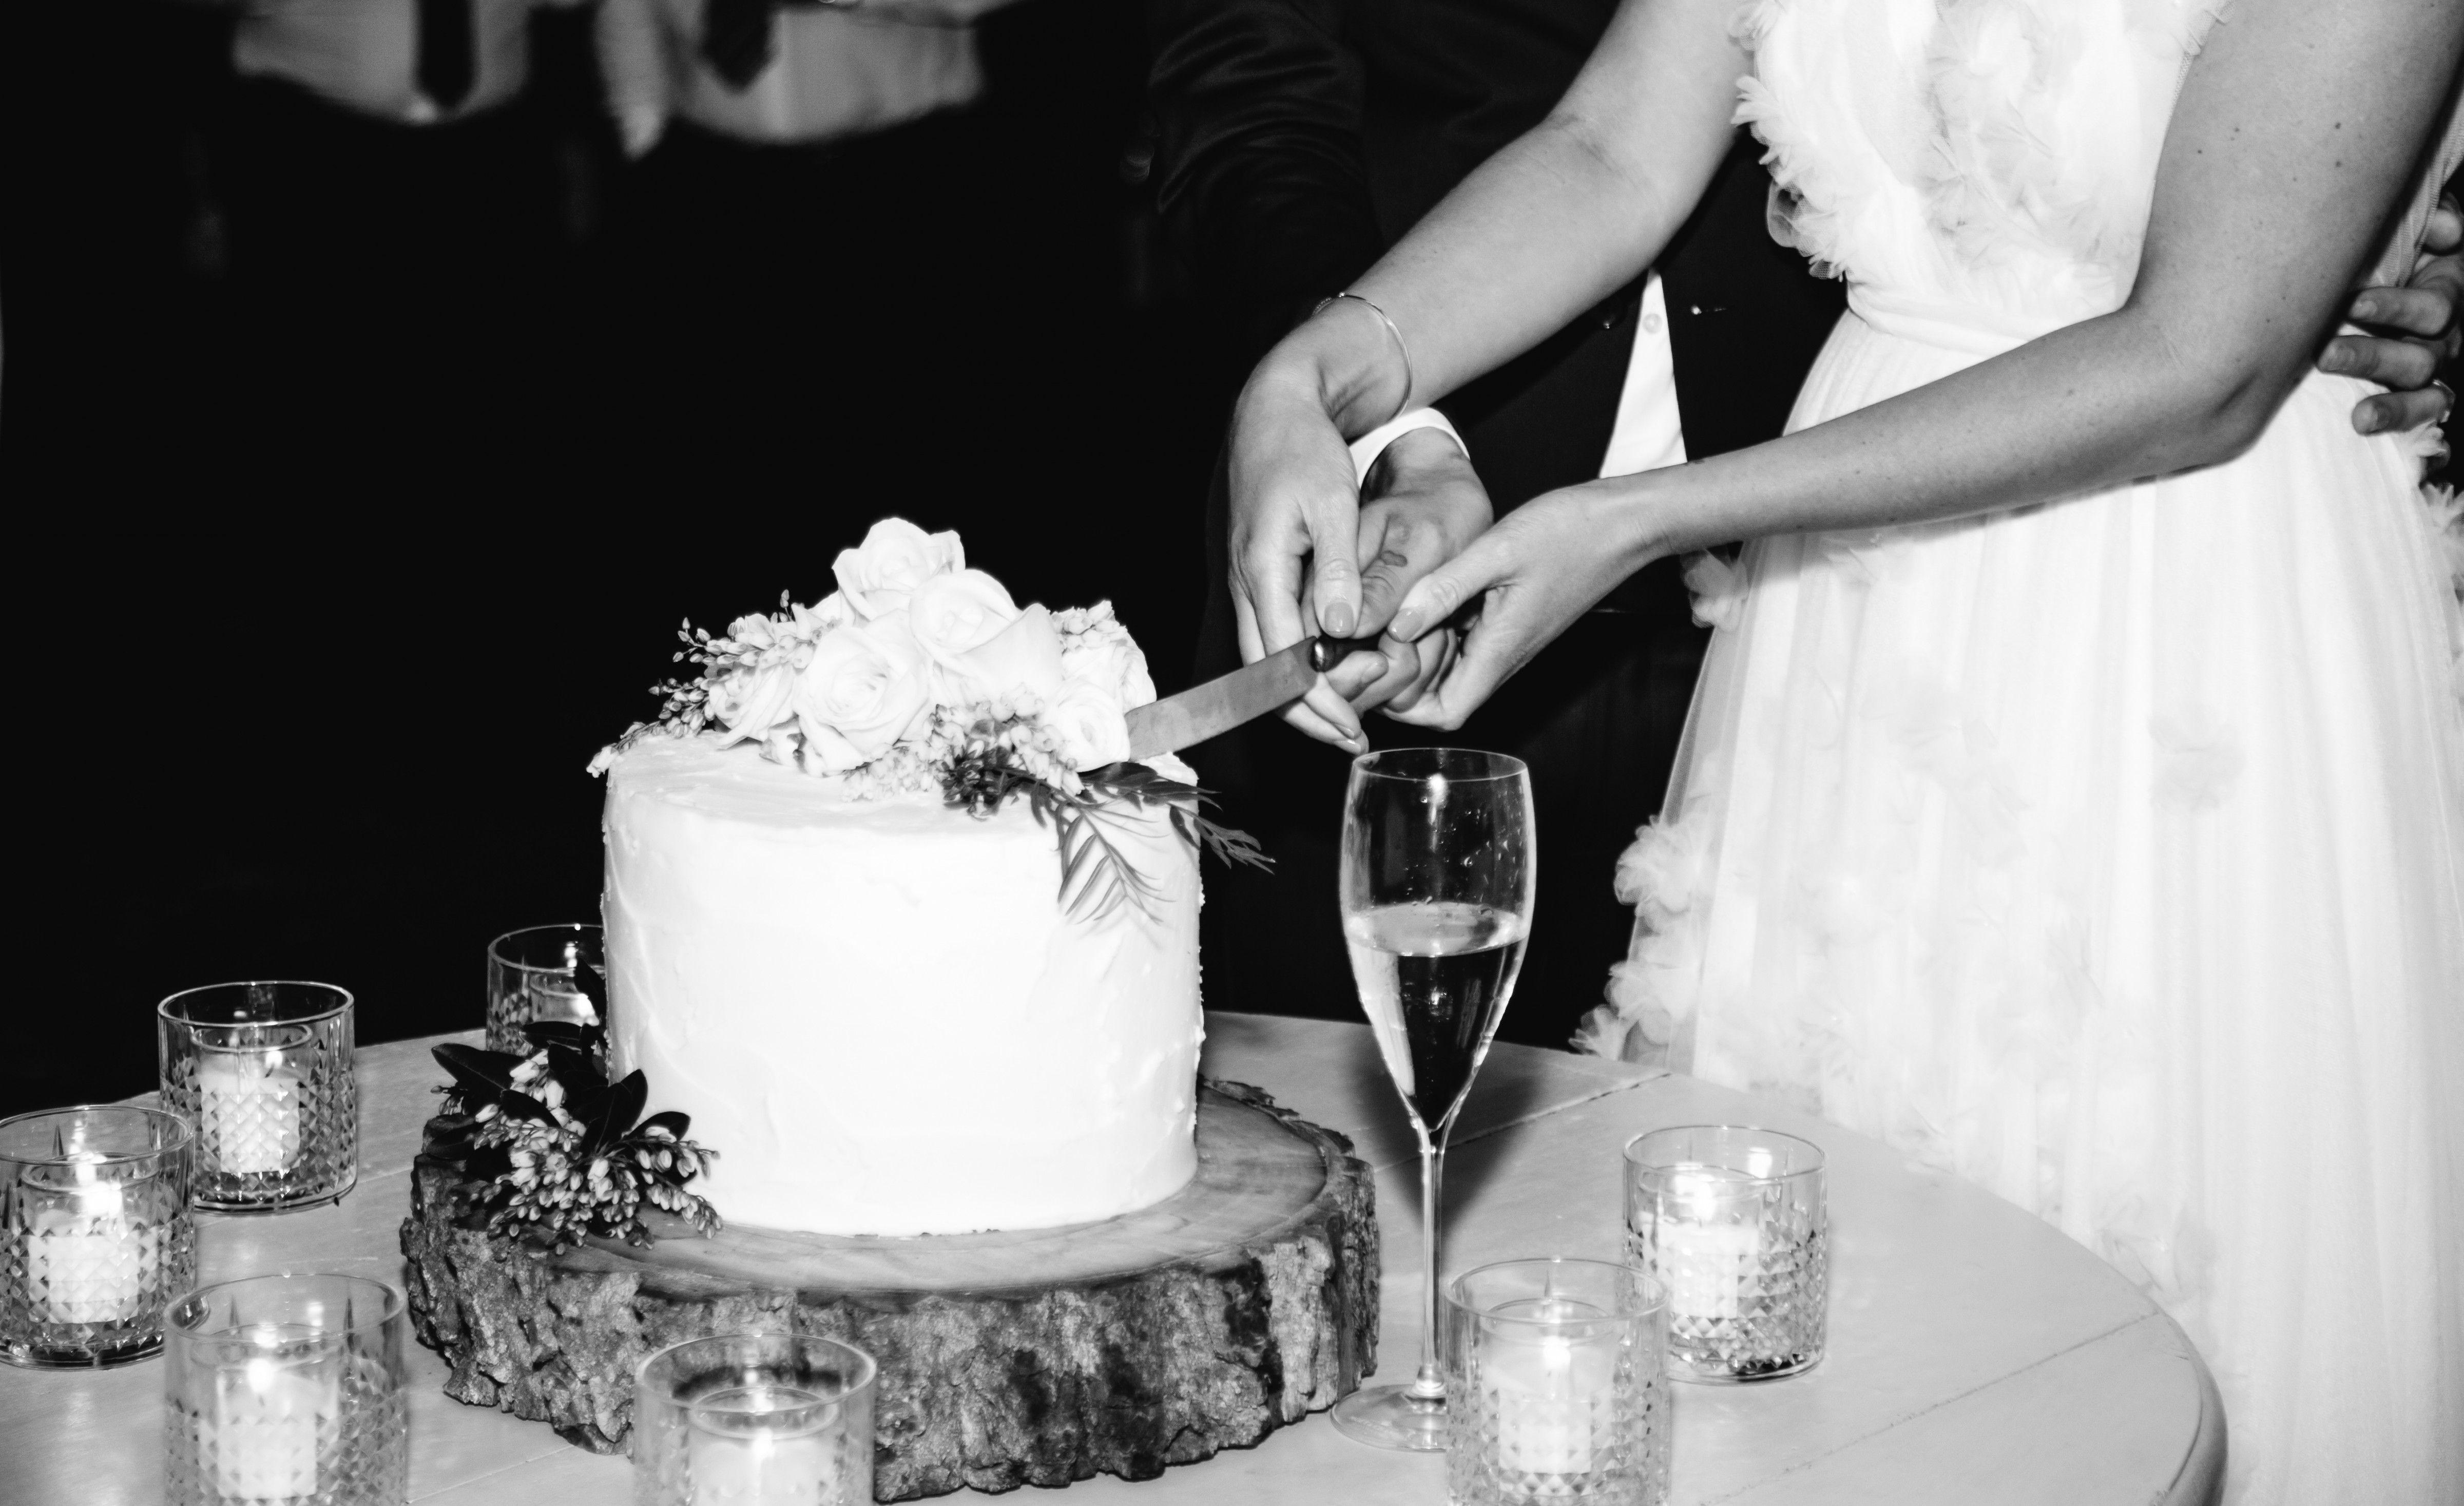 Badia di campoleone wedding cakes